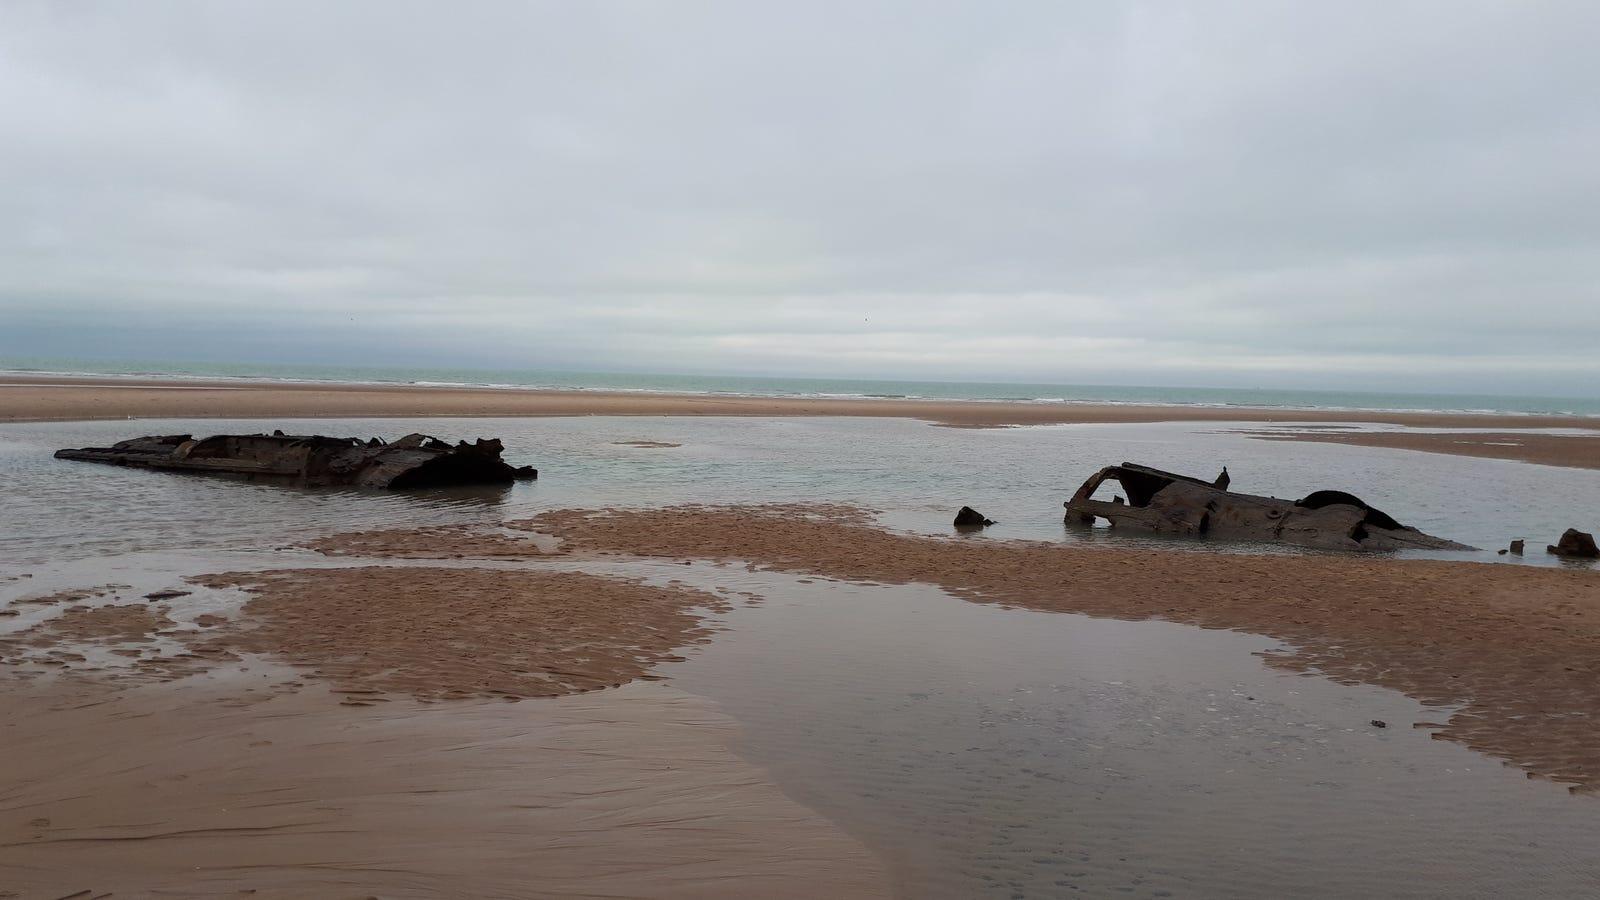 World War I-Era German Submarine Resurfaces From the Sand Near French Coast